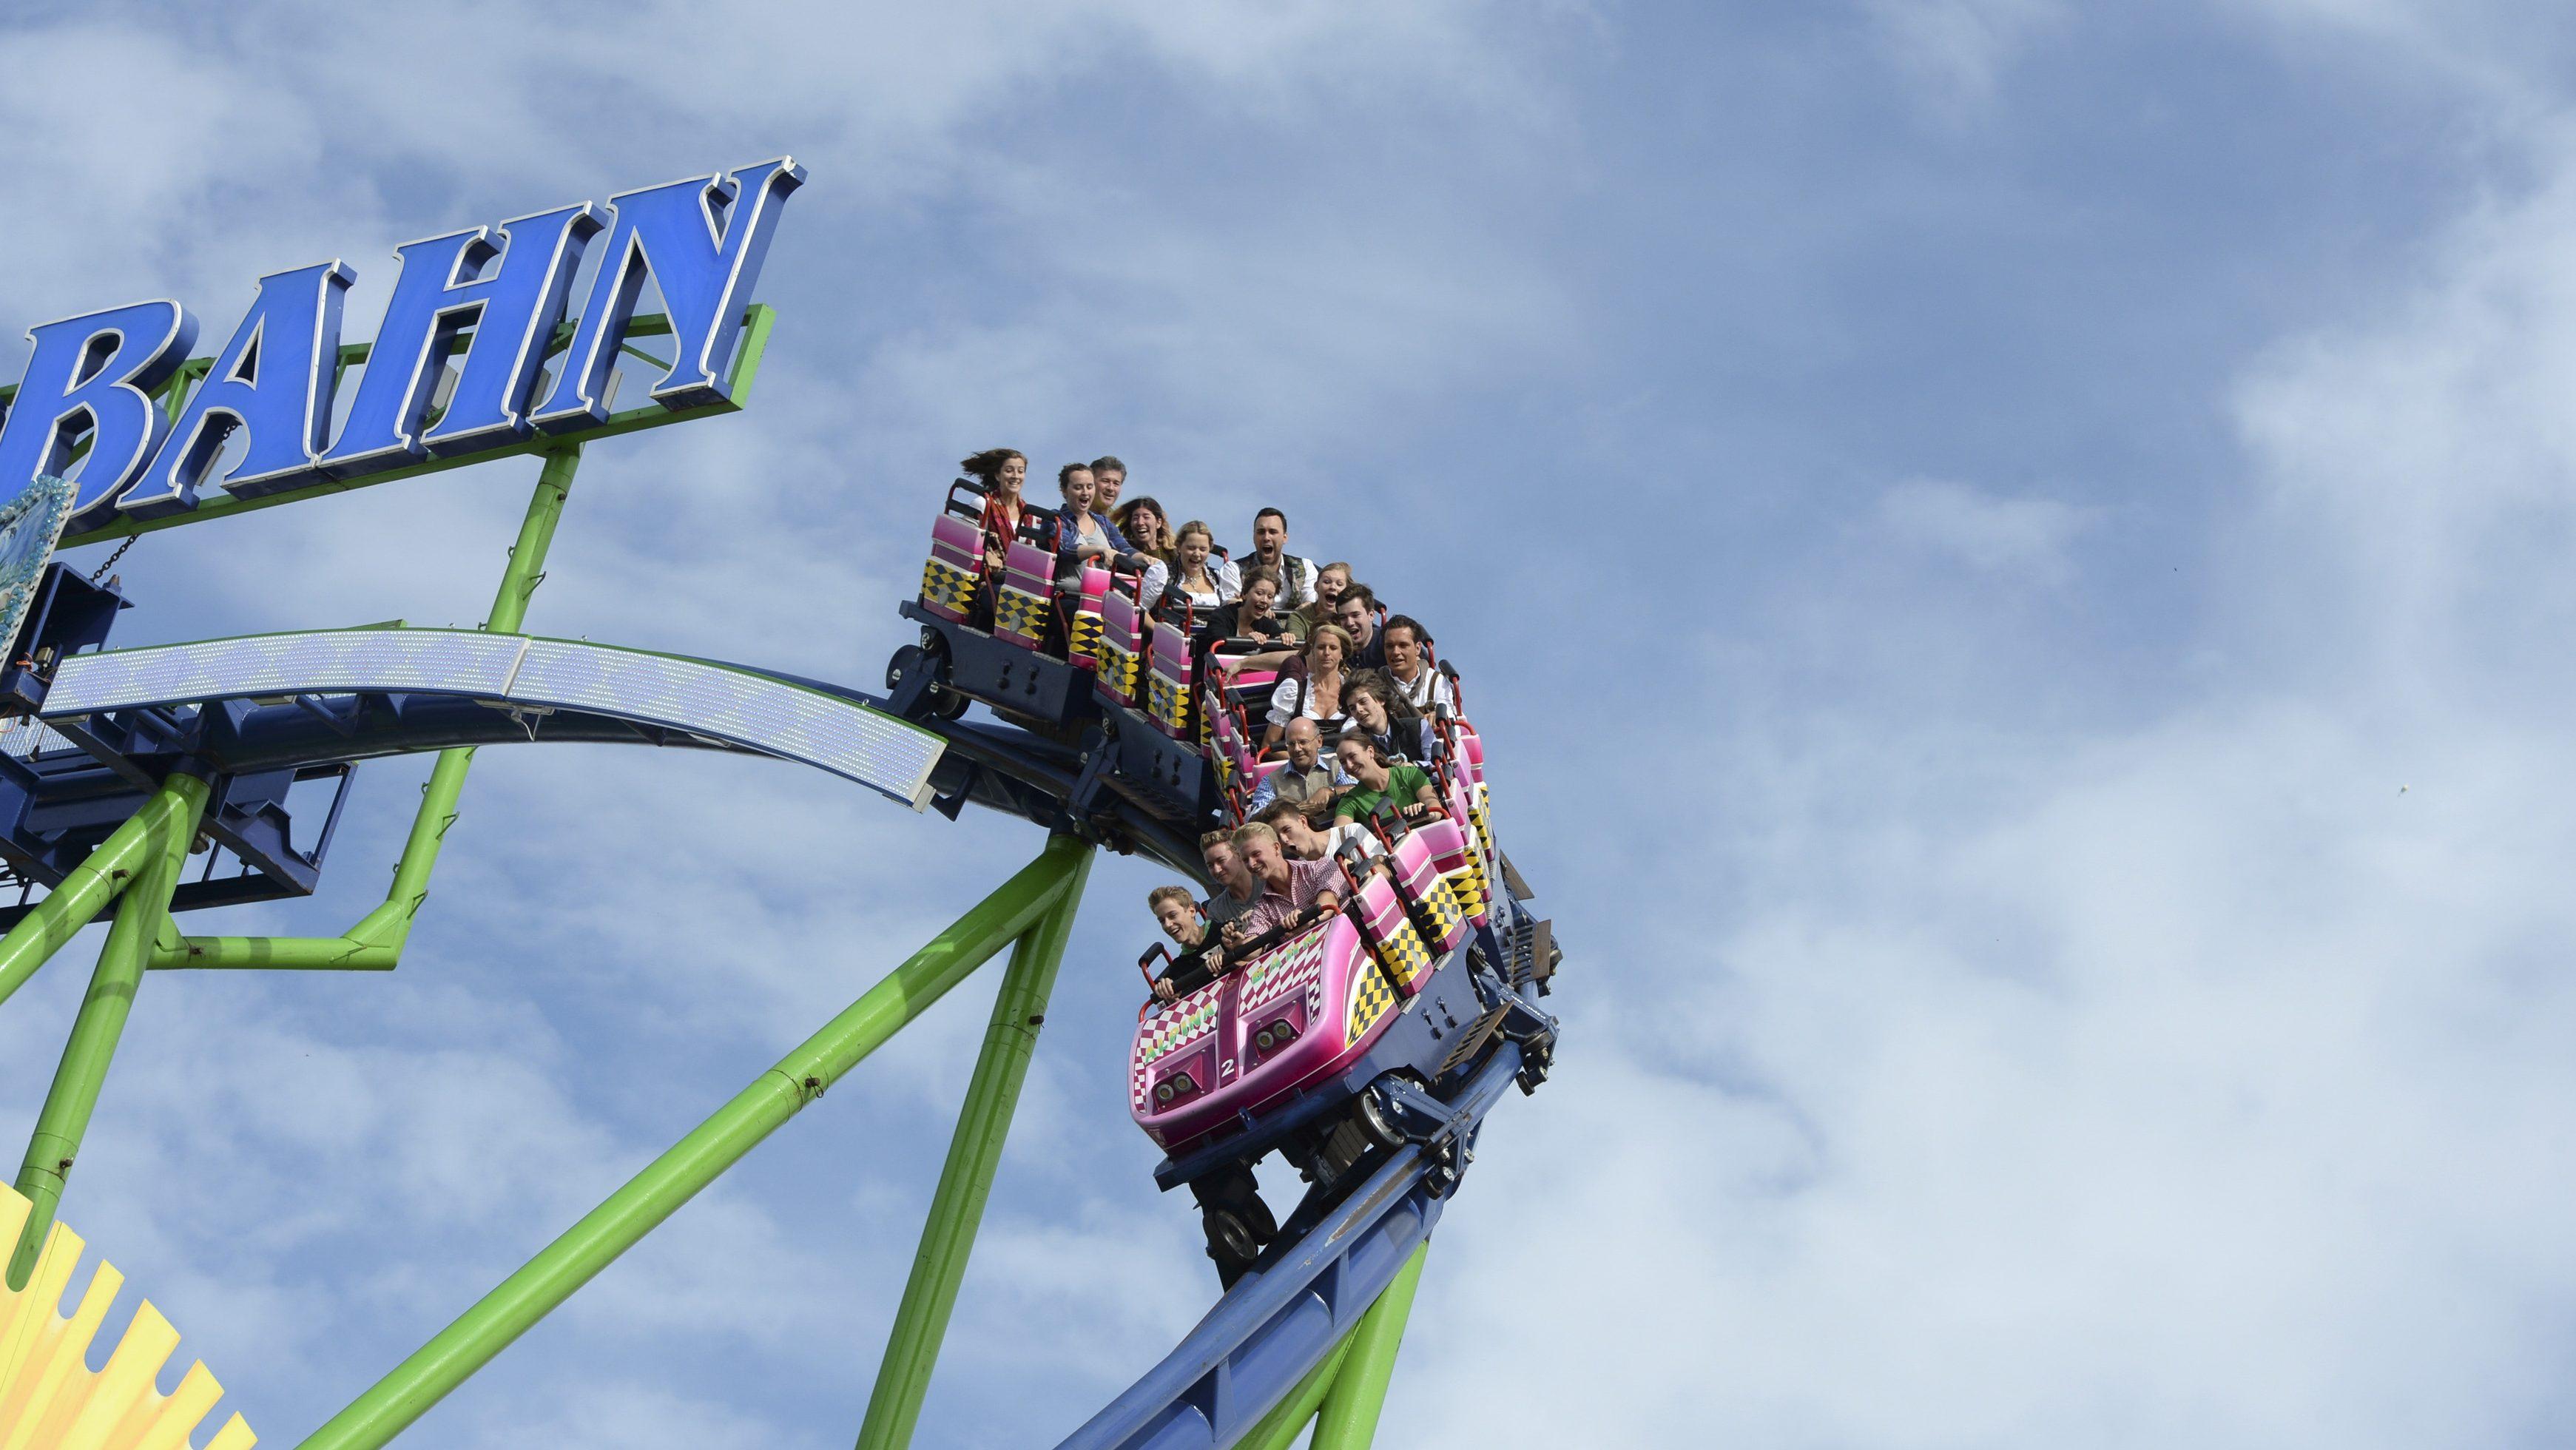 Visitors enjoy a rollercoaster ride in Munich.